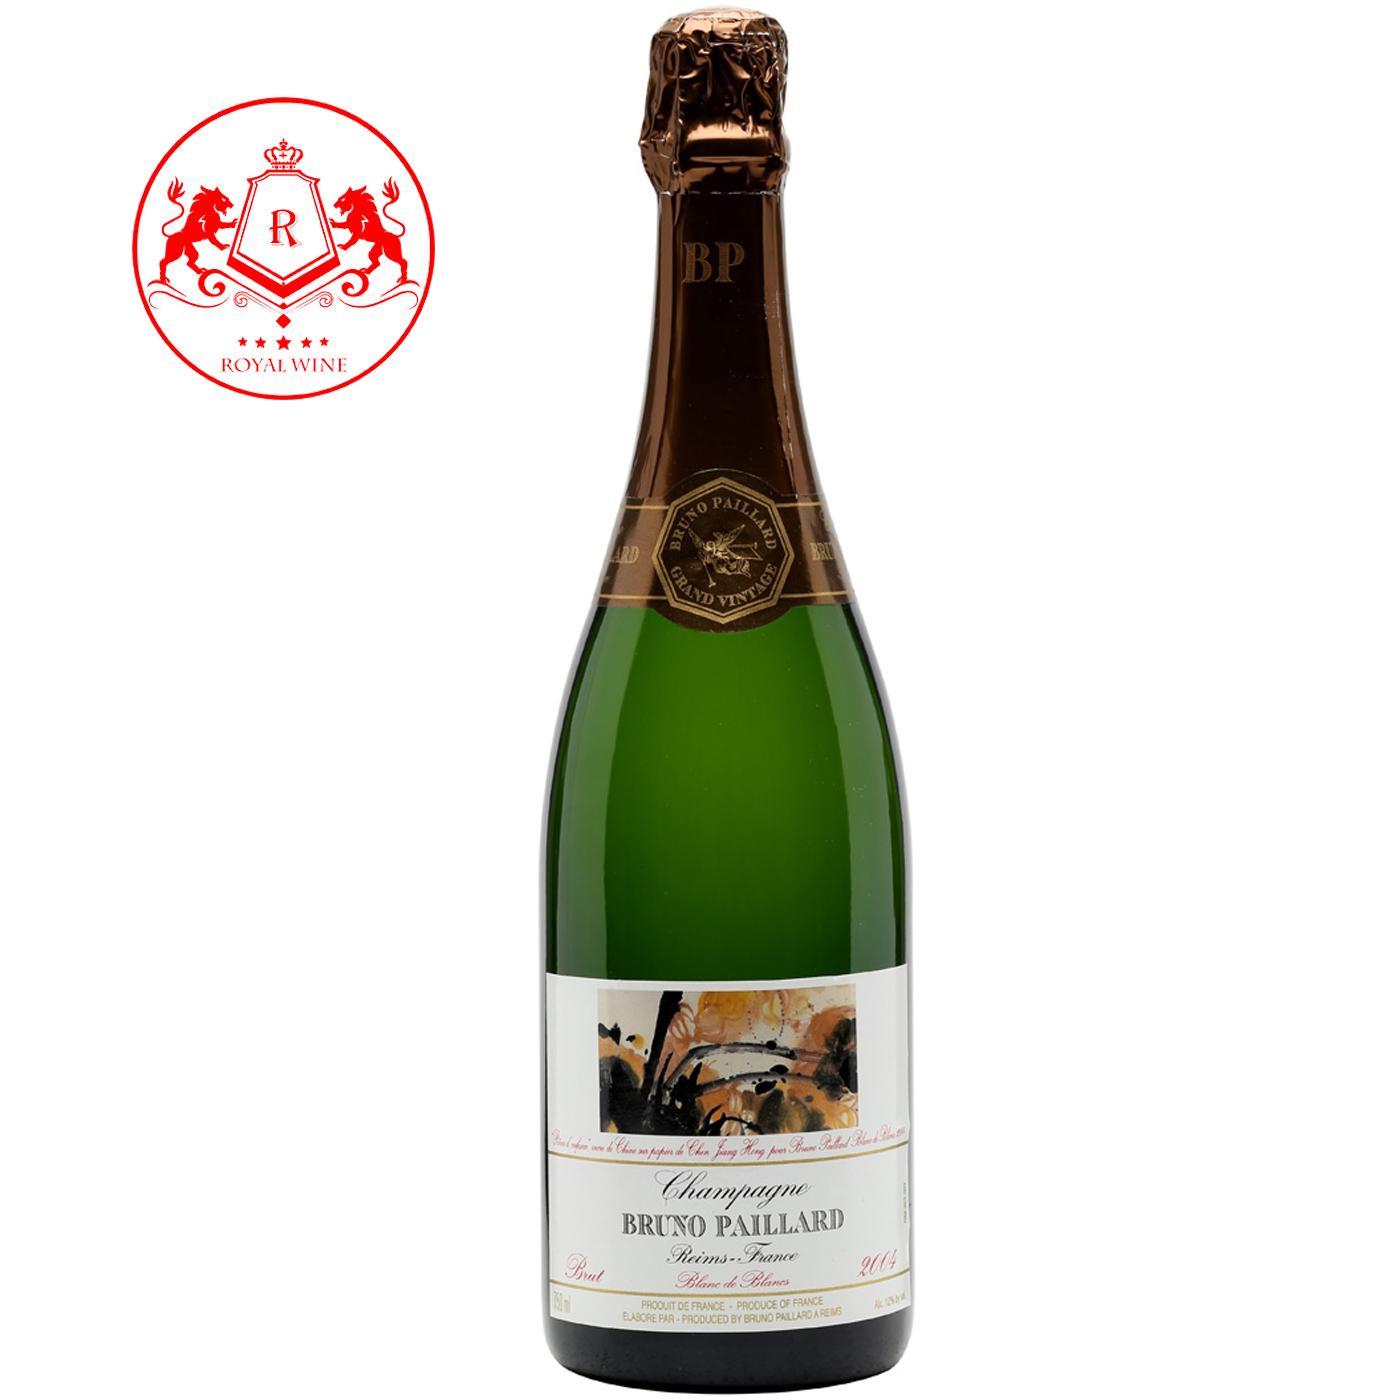 Champagne BRUNO PAILLARD Brut Blanc de Blanc